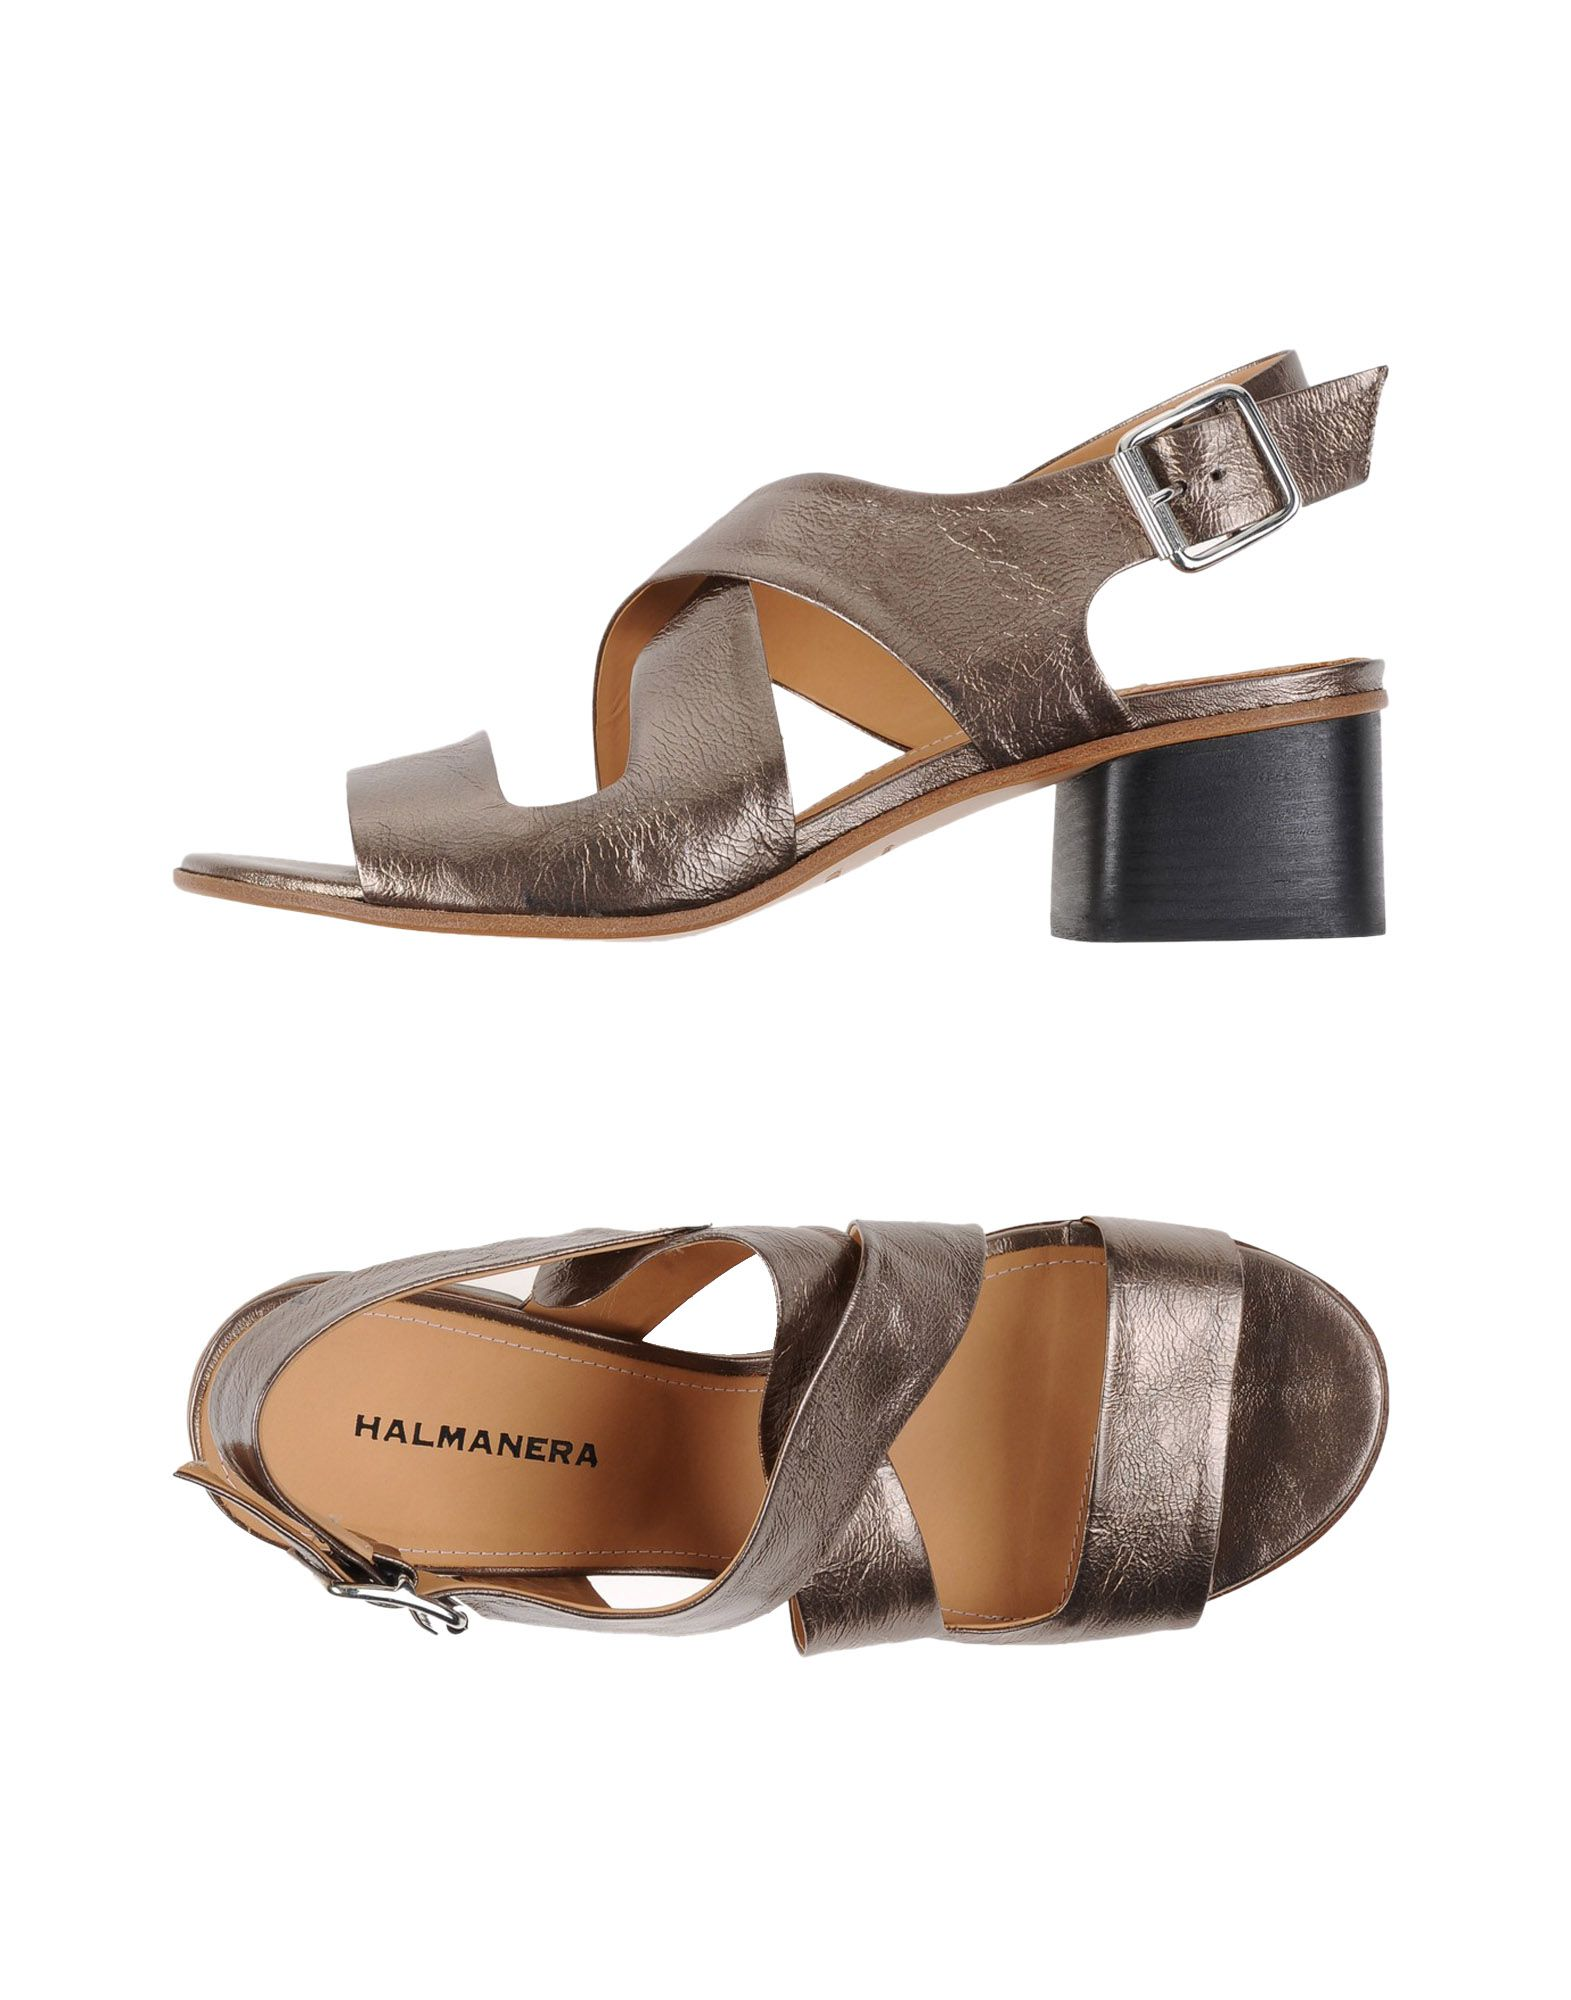 Stilvolle billige Sandalen Schuhe Halmanera Sandalen billige Damen  11102042PH 06bcd9